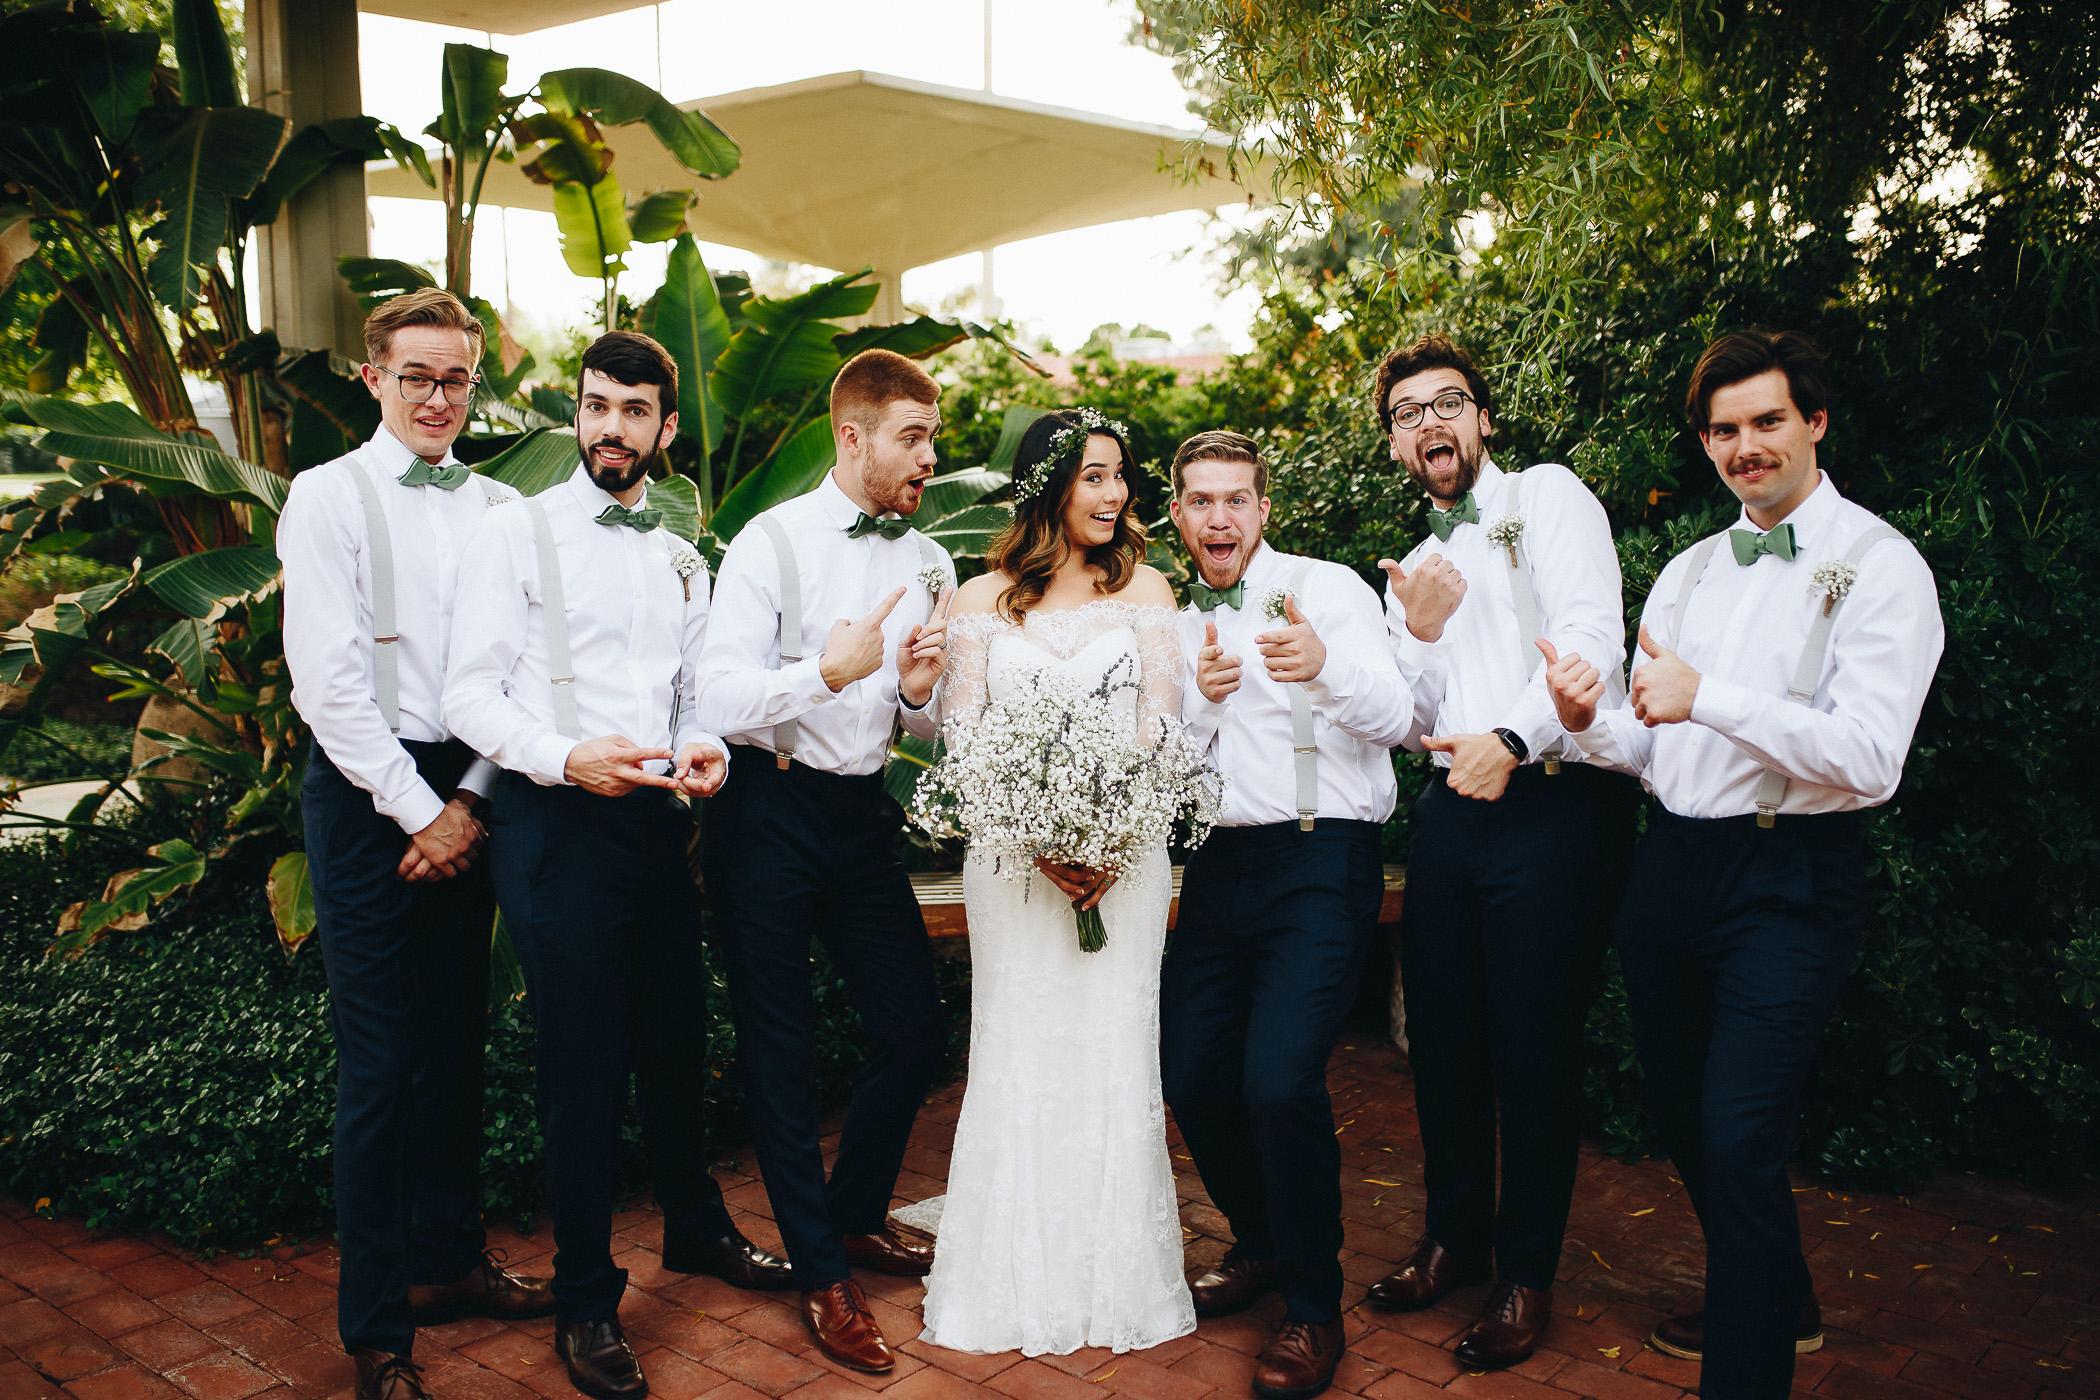 181104-Luxium-Weddings-Arizona-@matt__Le-Brandon-Kariana-Phoenix-Valley-Garden-Center-1089.jpg